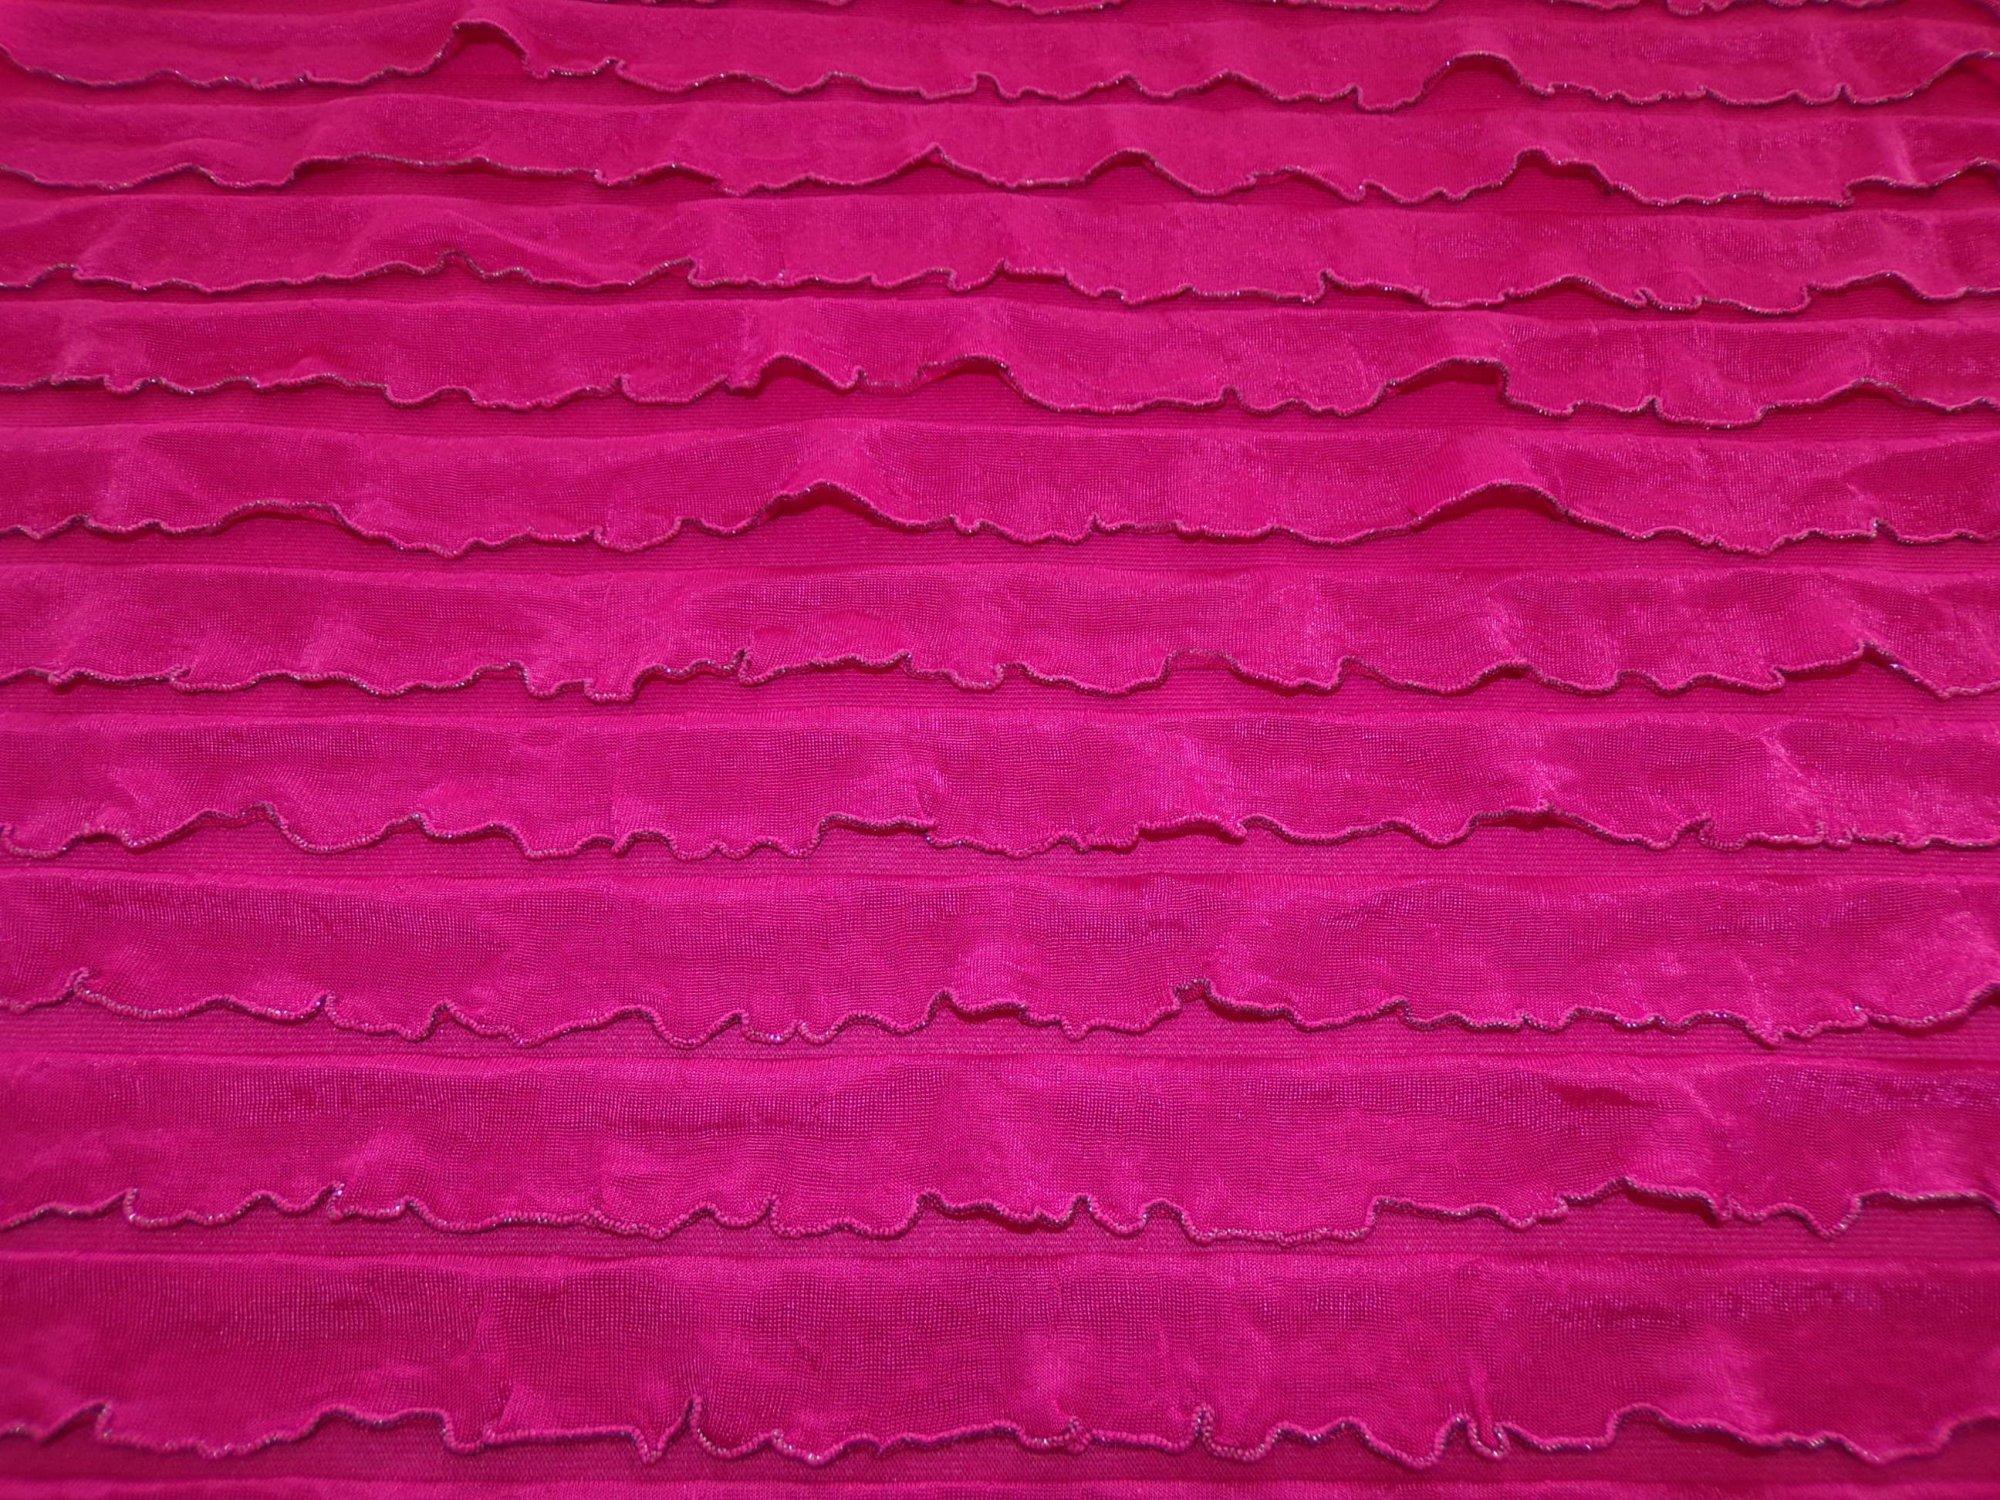 Polyester Nylon Ruffles - Raspberry